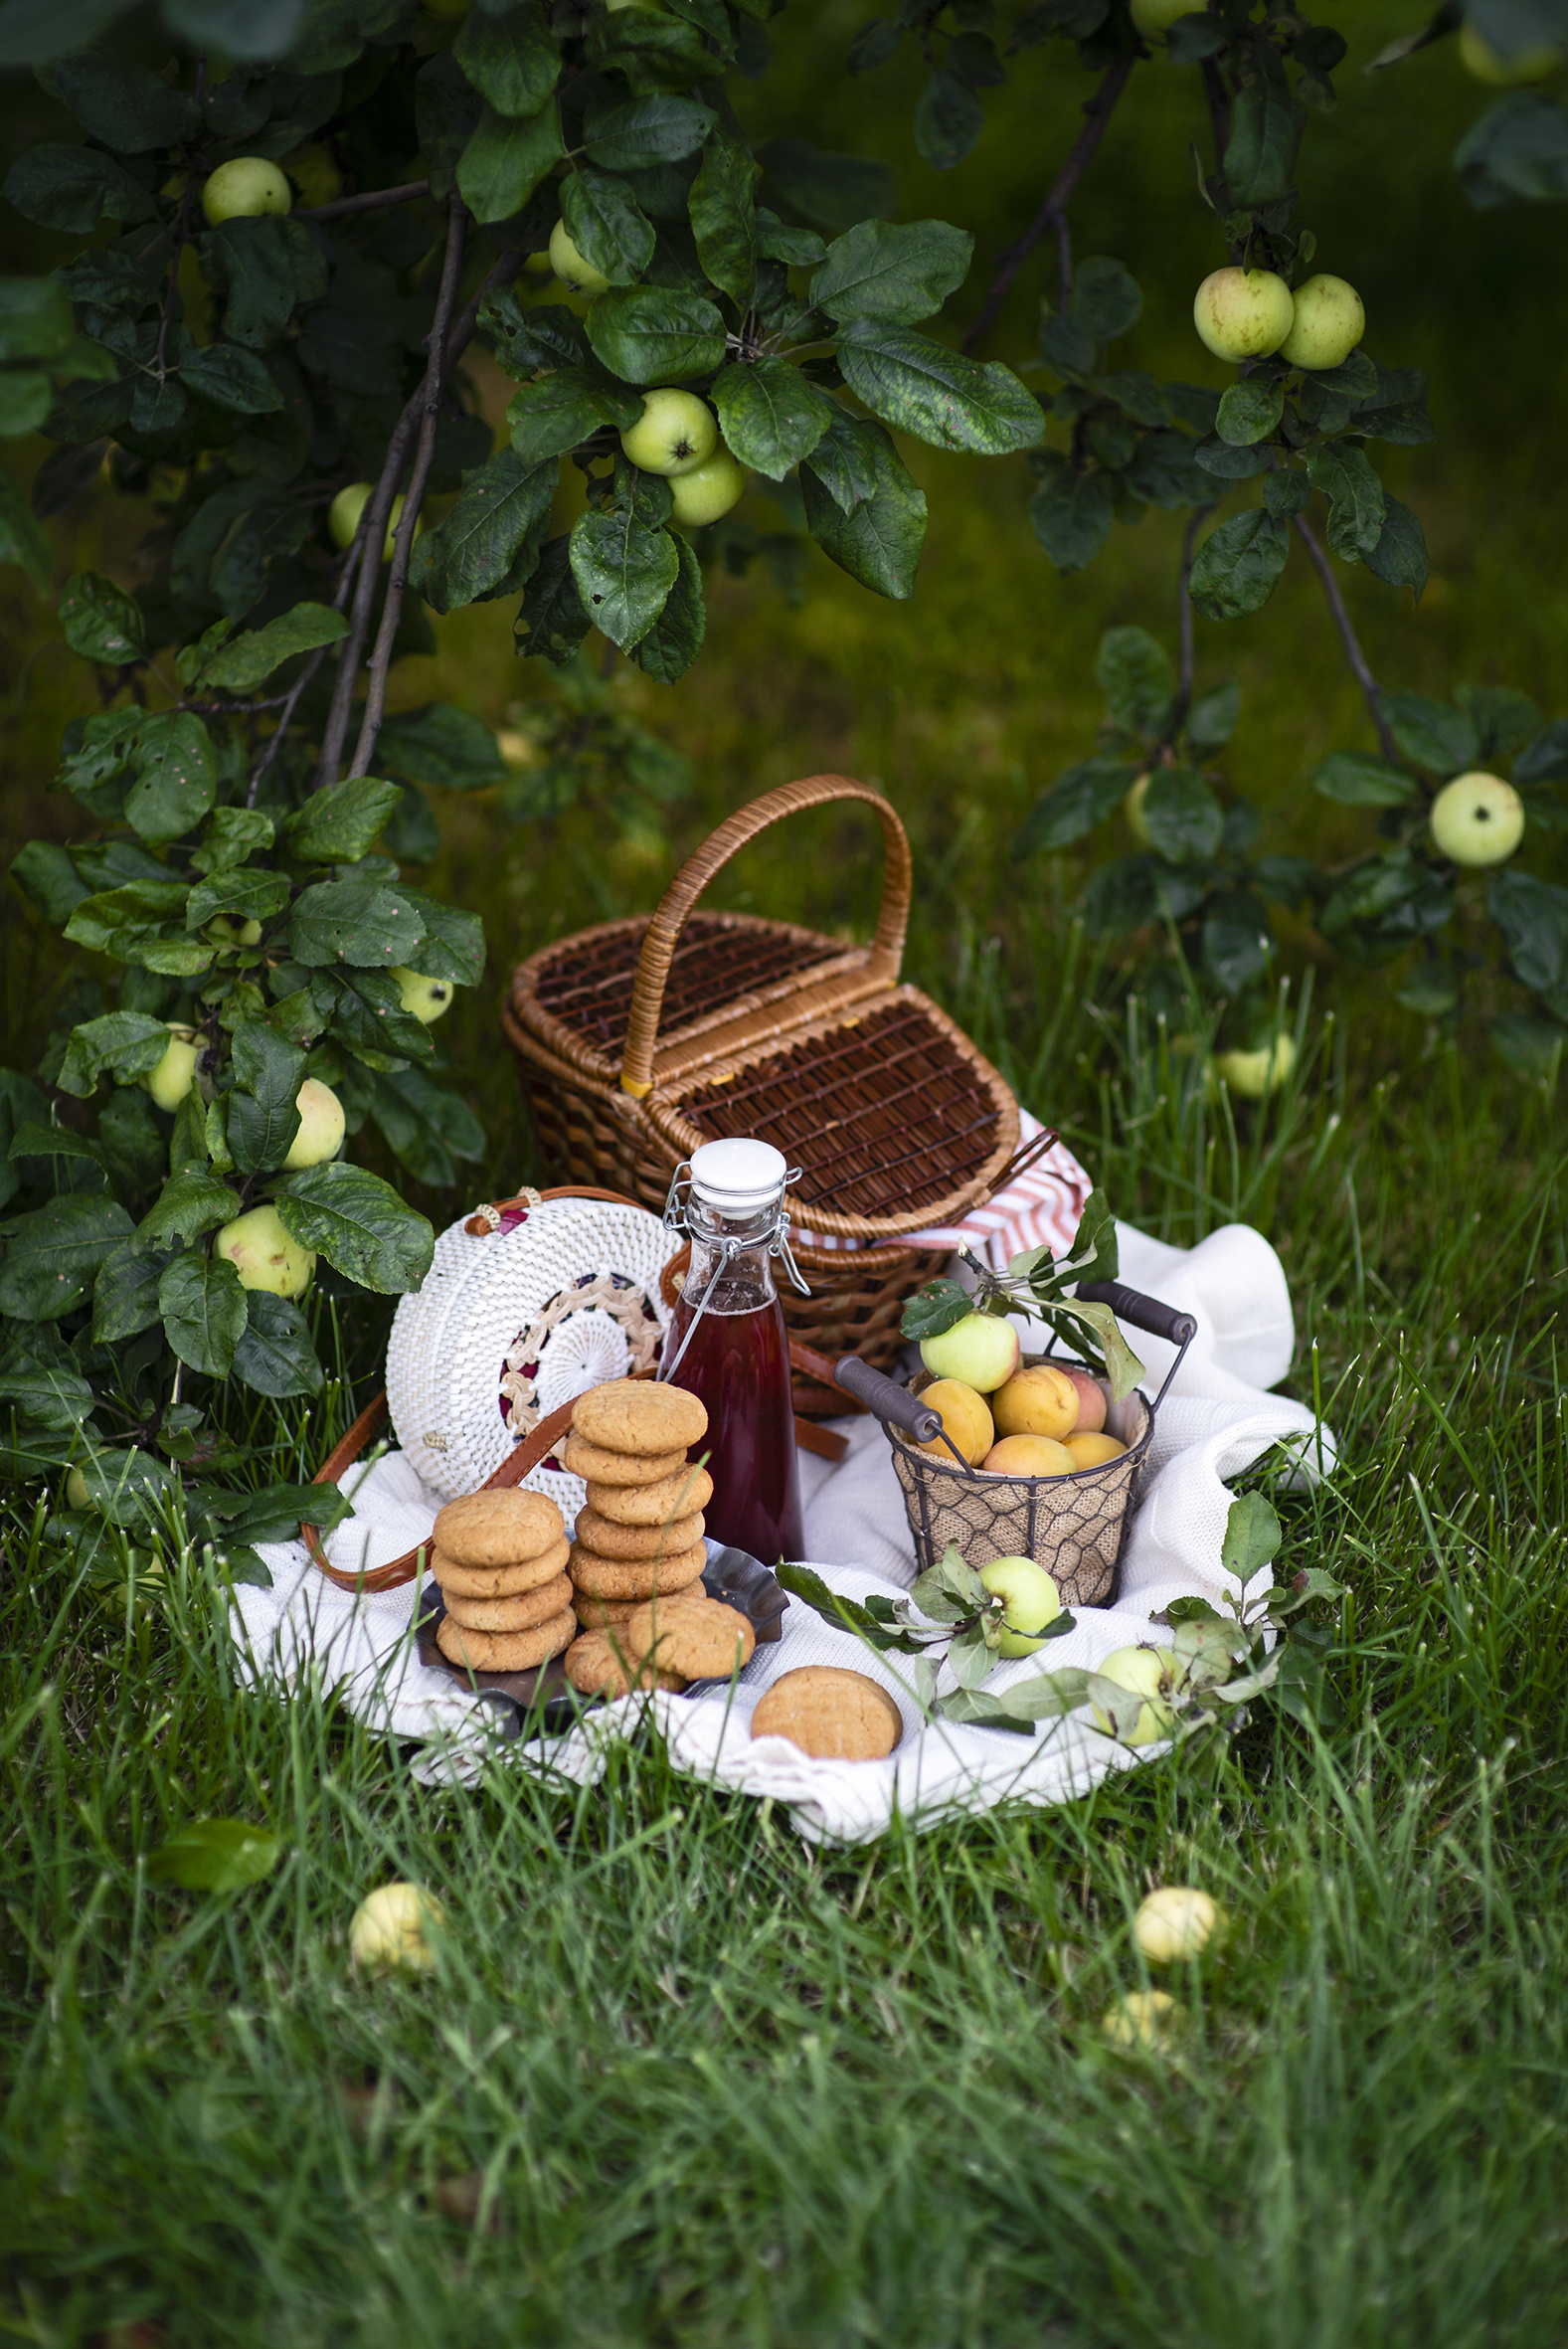 Wallpaper Picnic Apricot Apples Wicker basket Food Cookies bottles  for Mobile phone Bottle